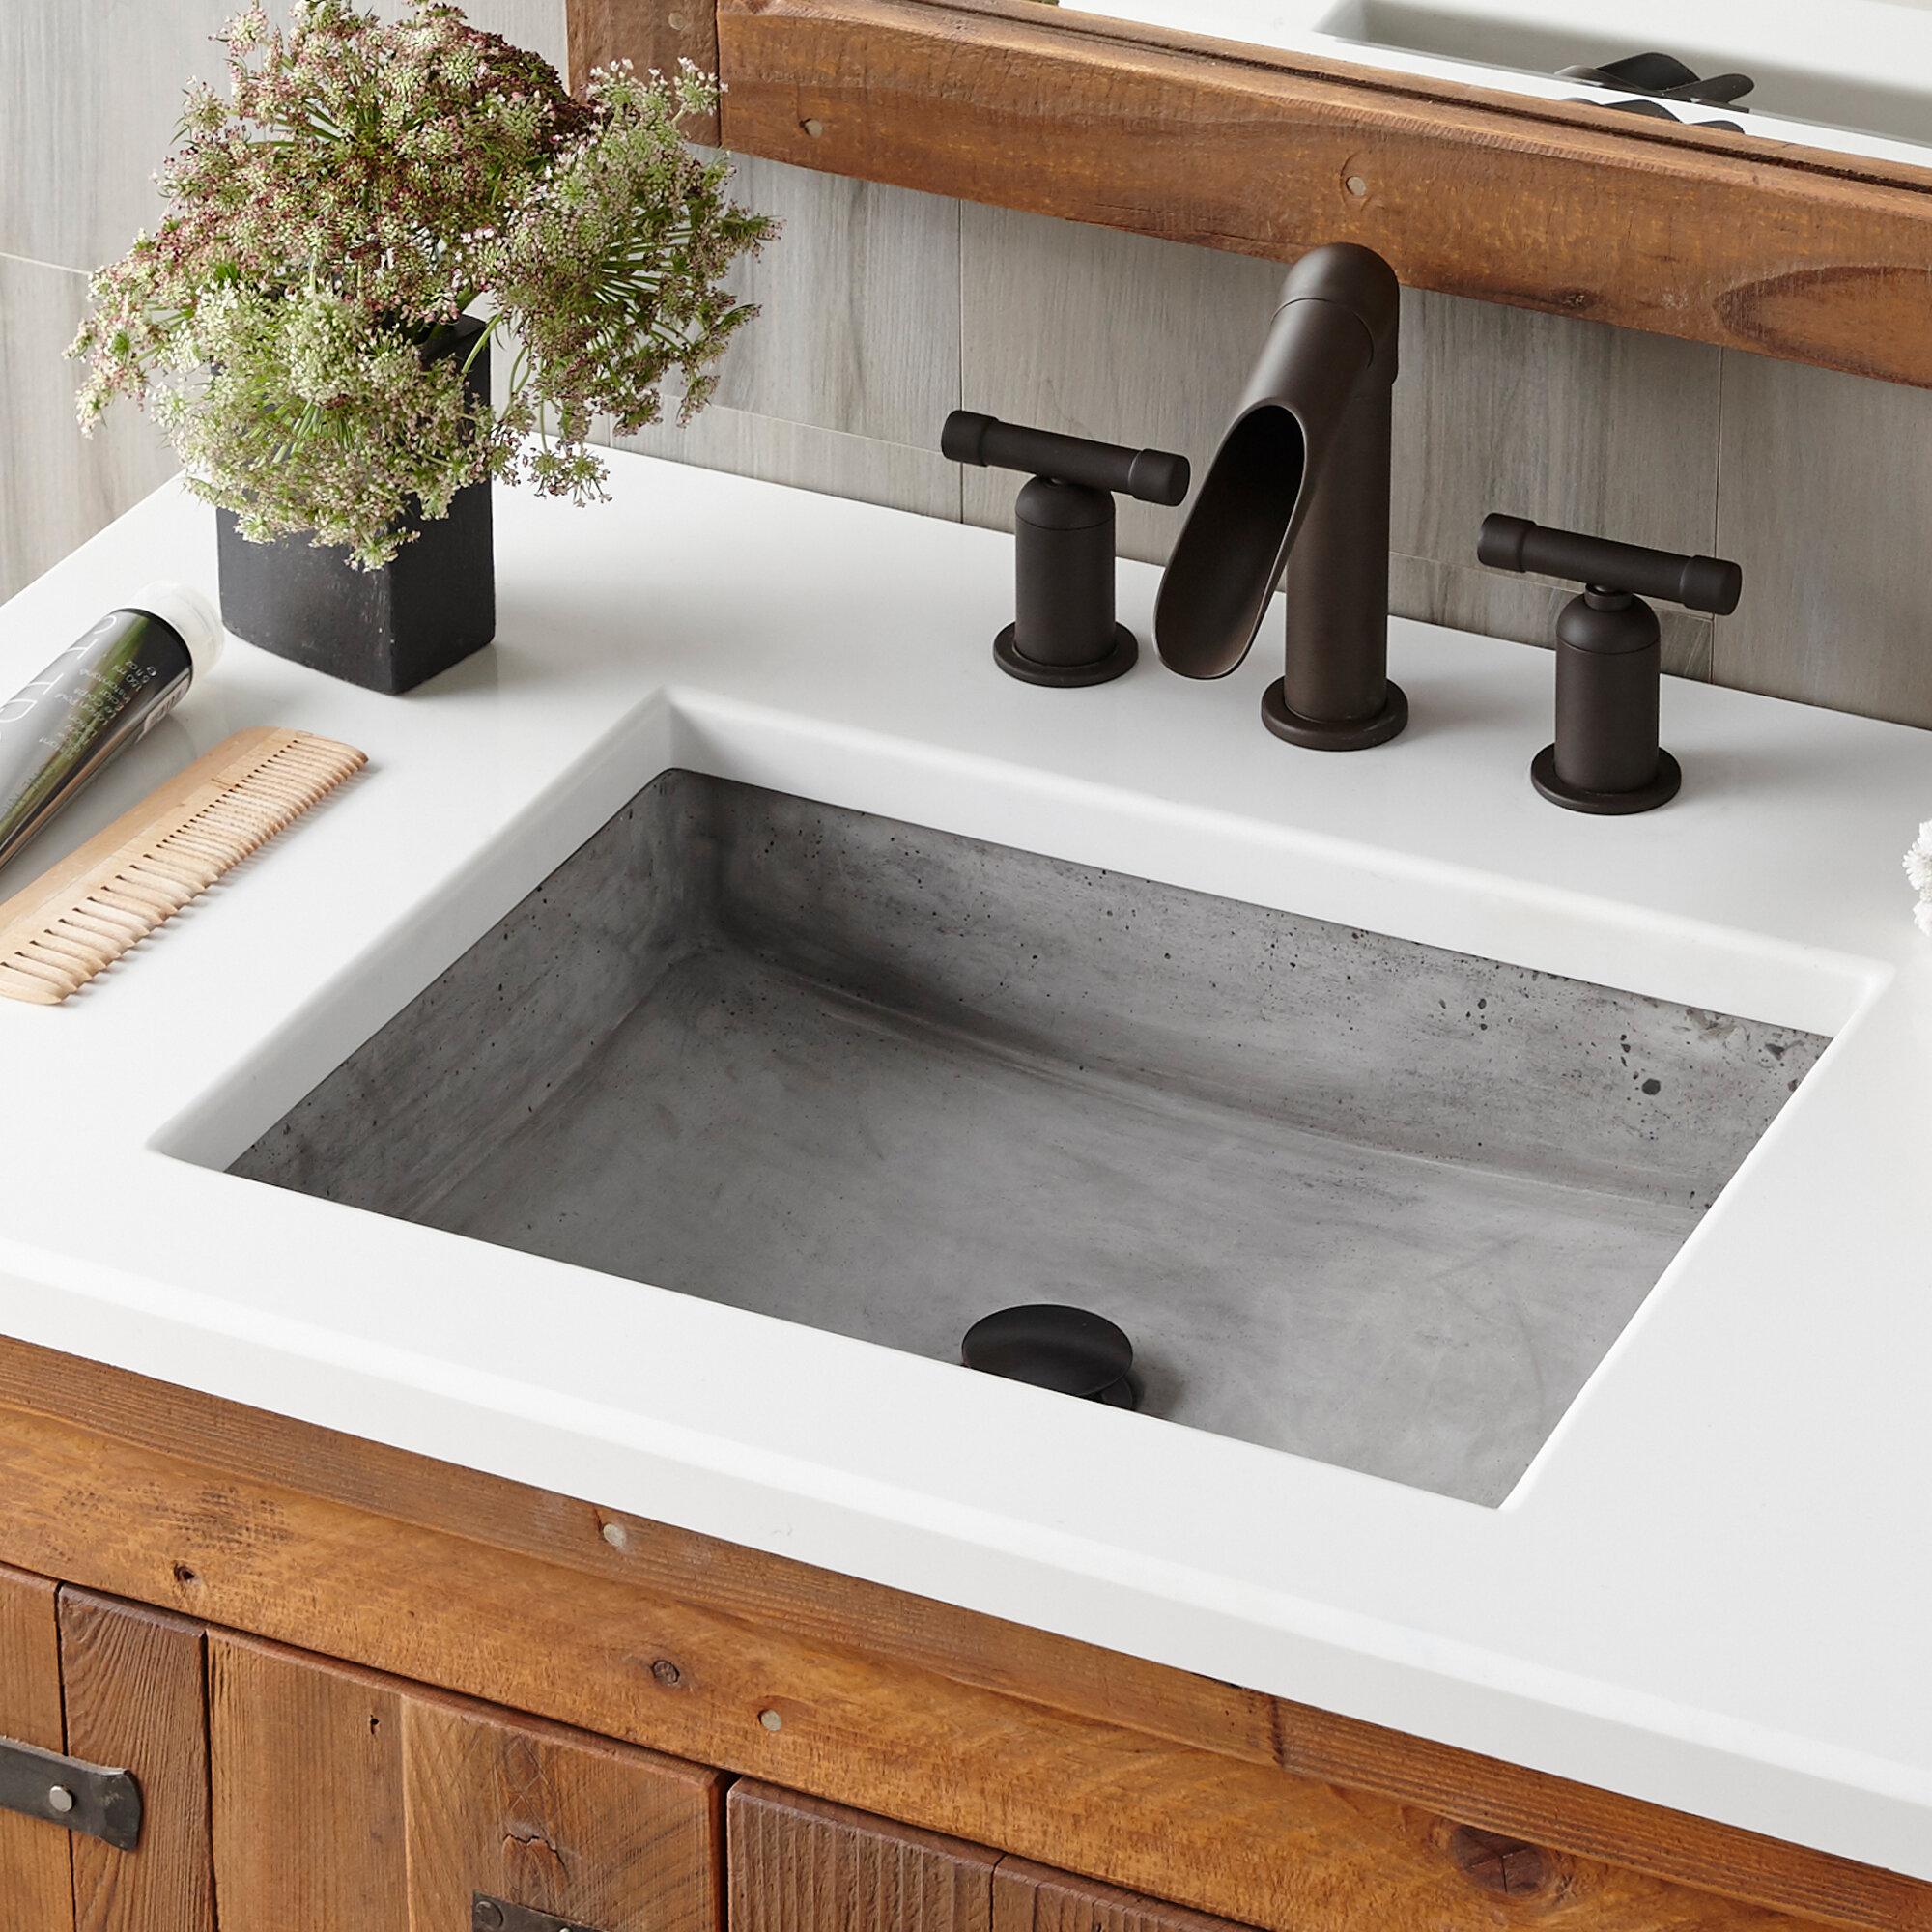 Native Trails Stone Handmade Rectangular Vessel Bathroom Sink Reviews Wayfair